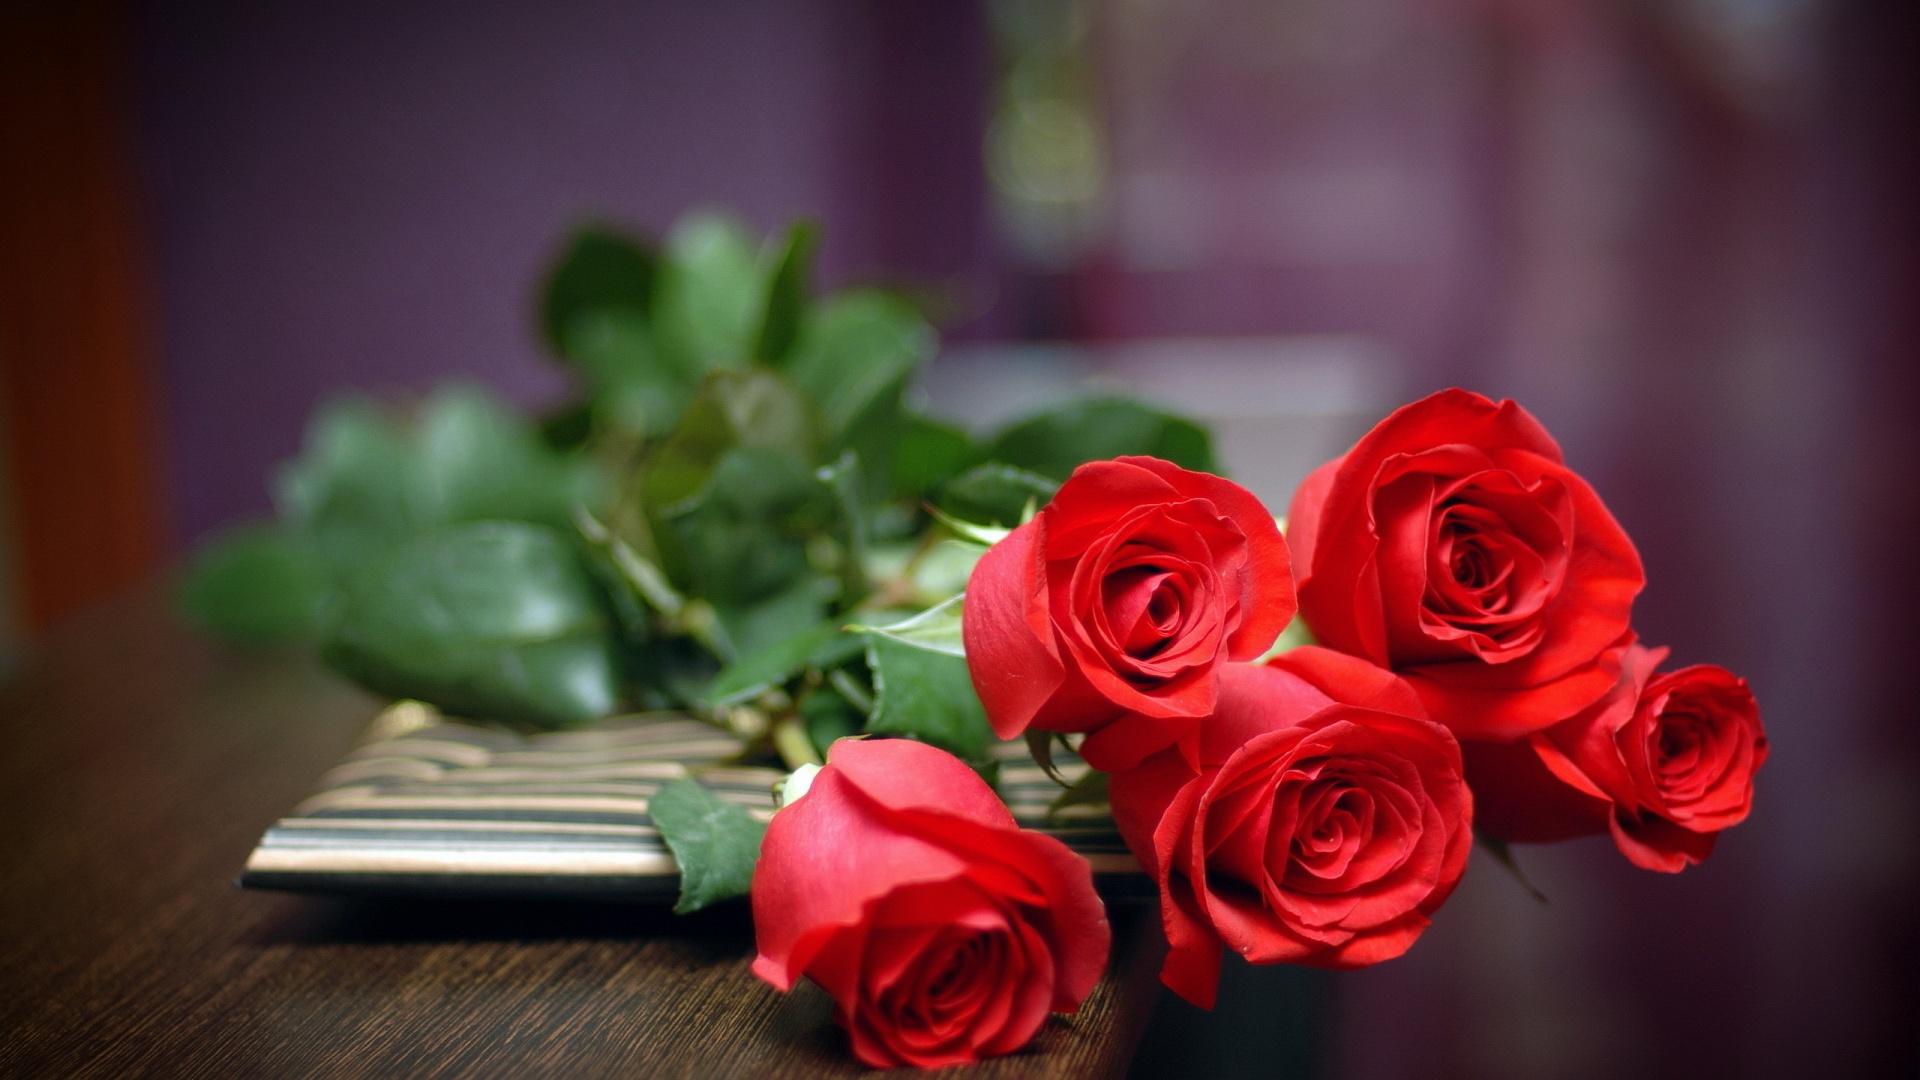 Red Rose Love